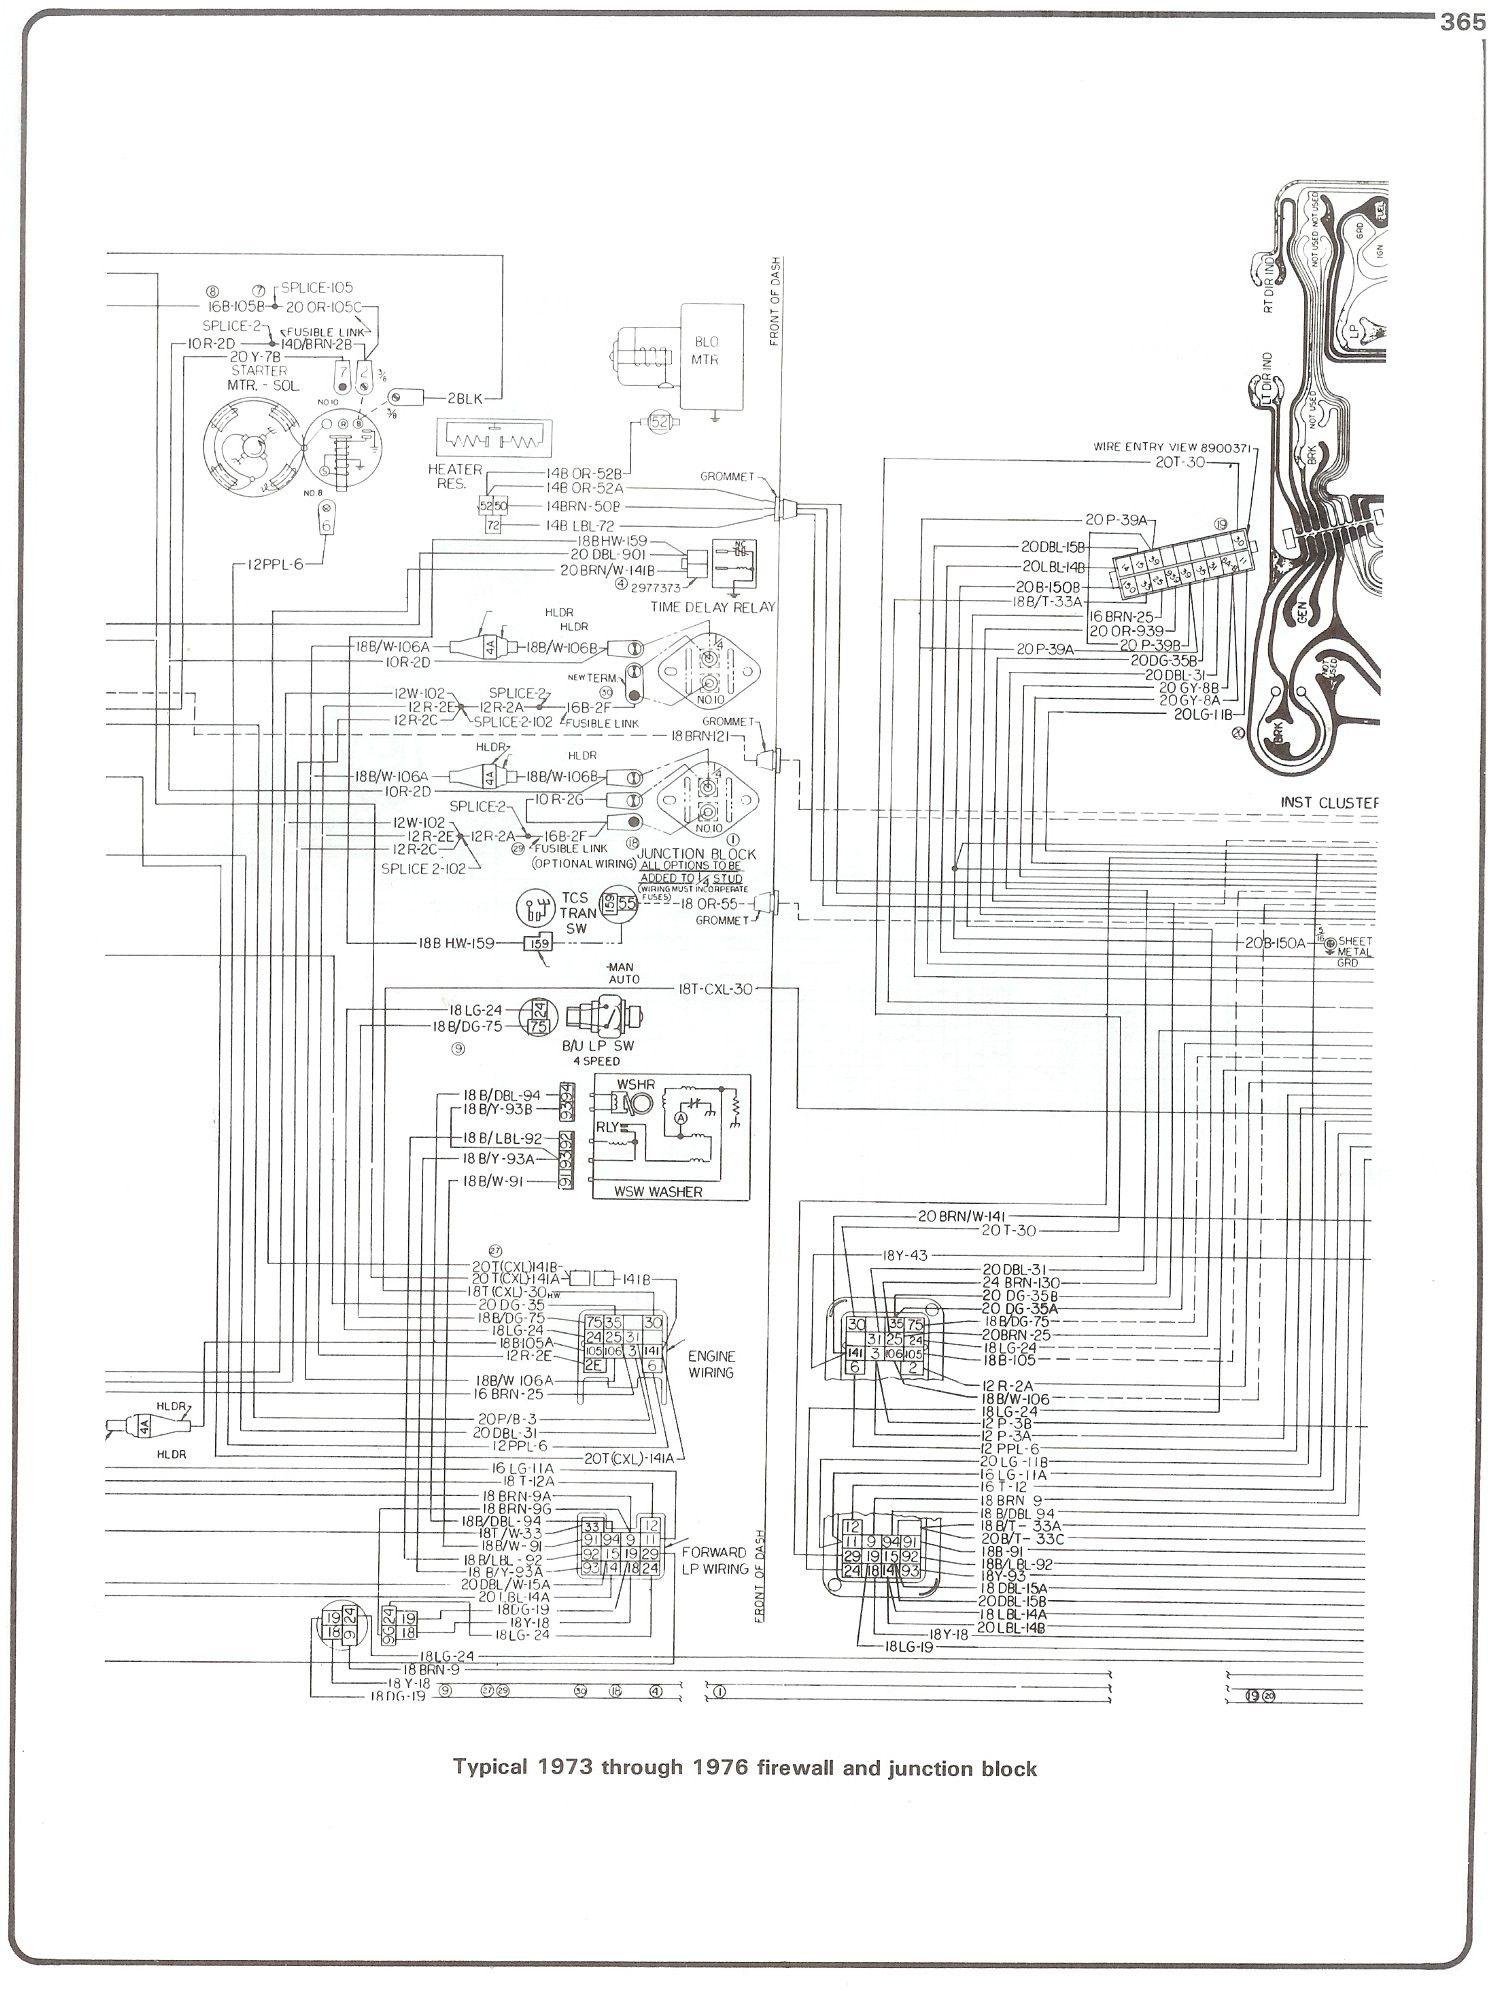 84 Chevy Truck Wiring Diagram In 2021 1978 Chevy Truck Chevy Trucks Big Chevy Trucks